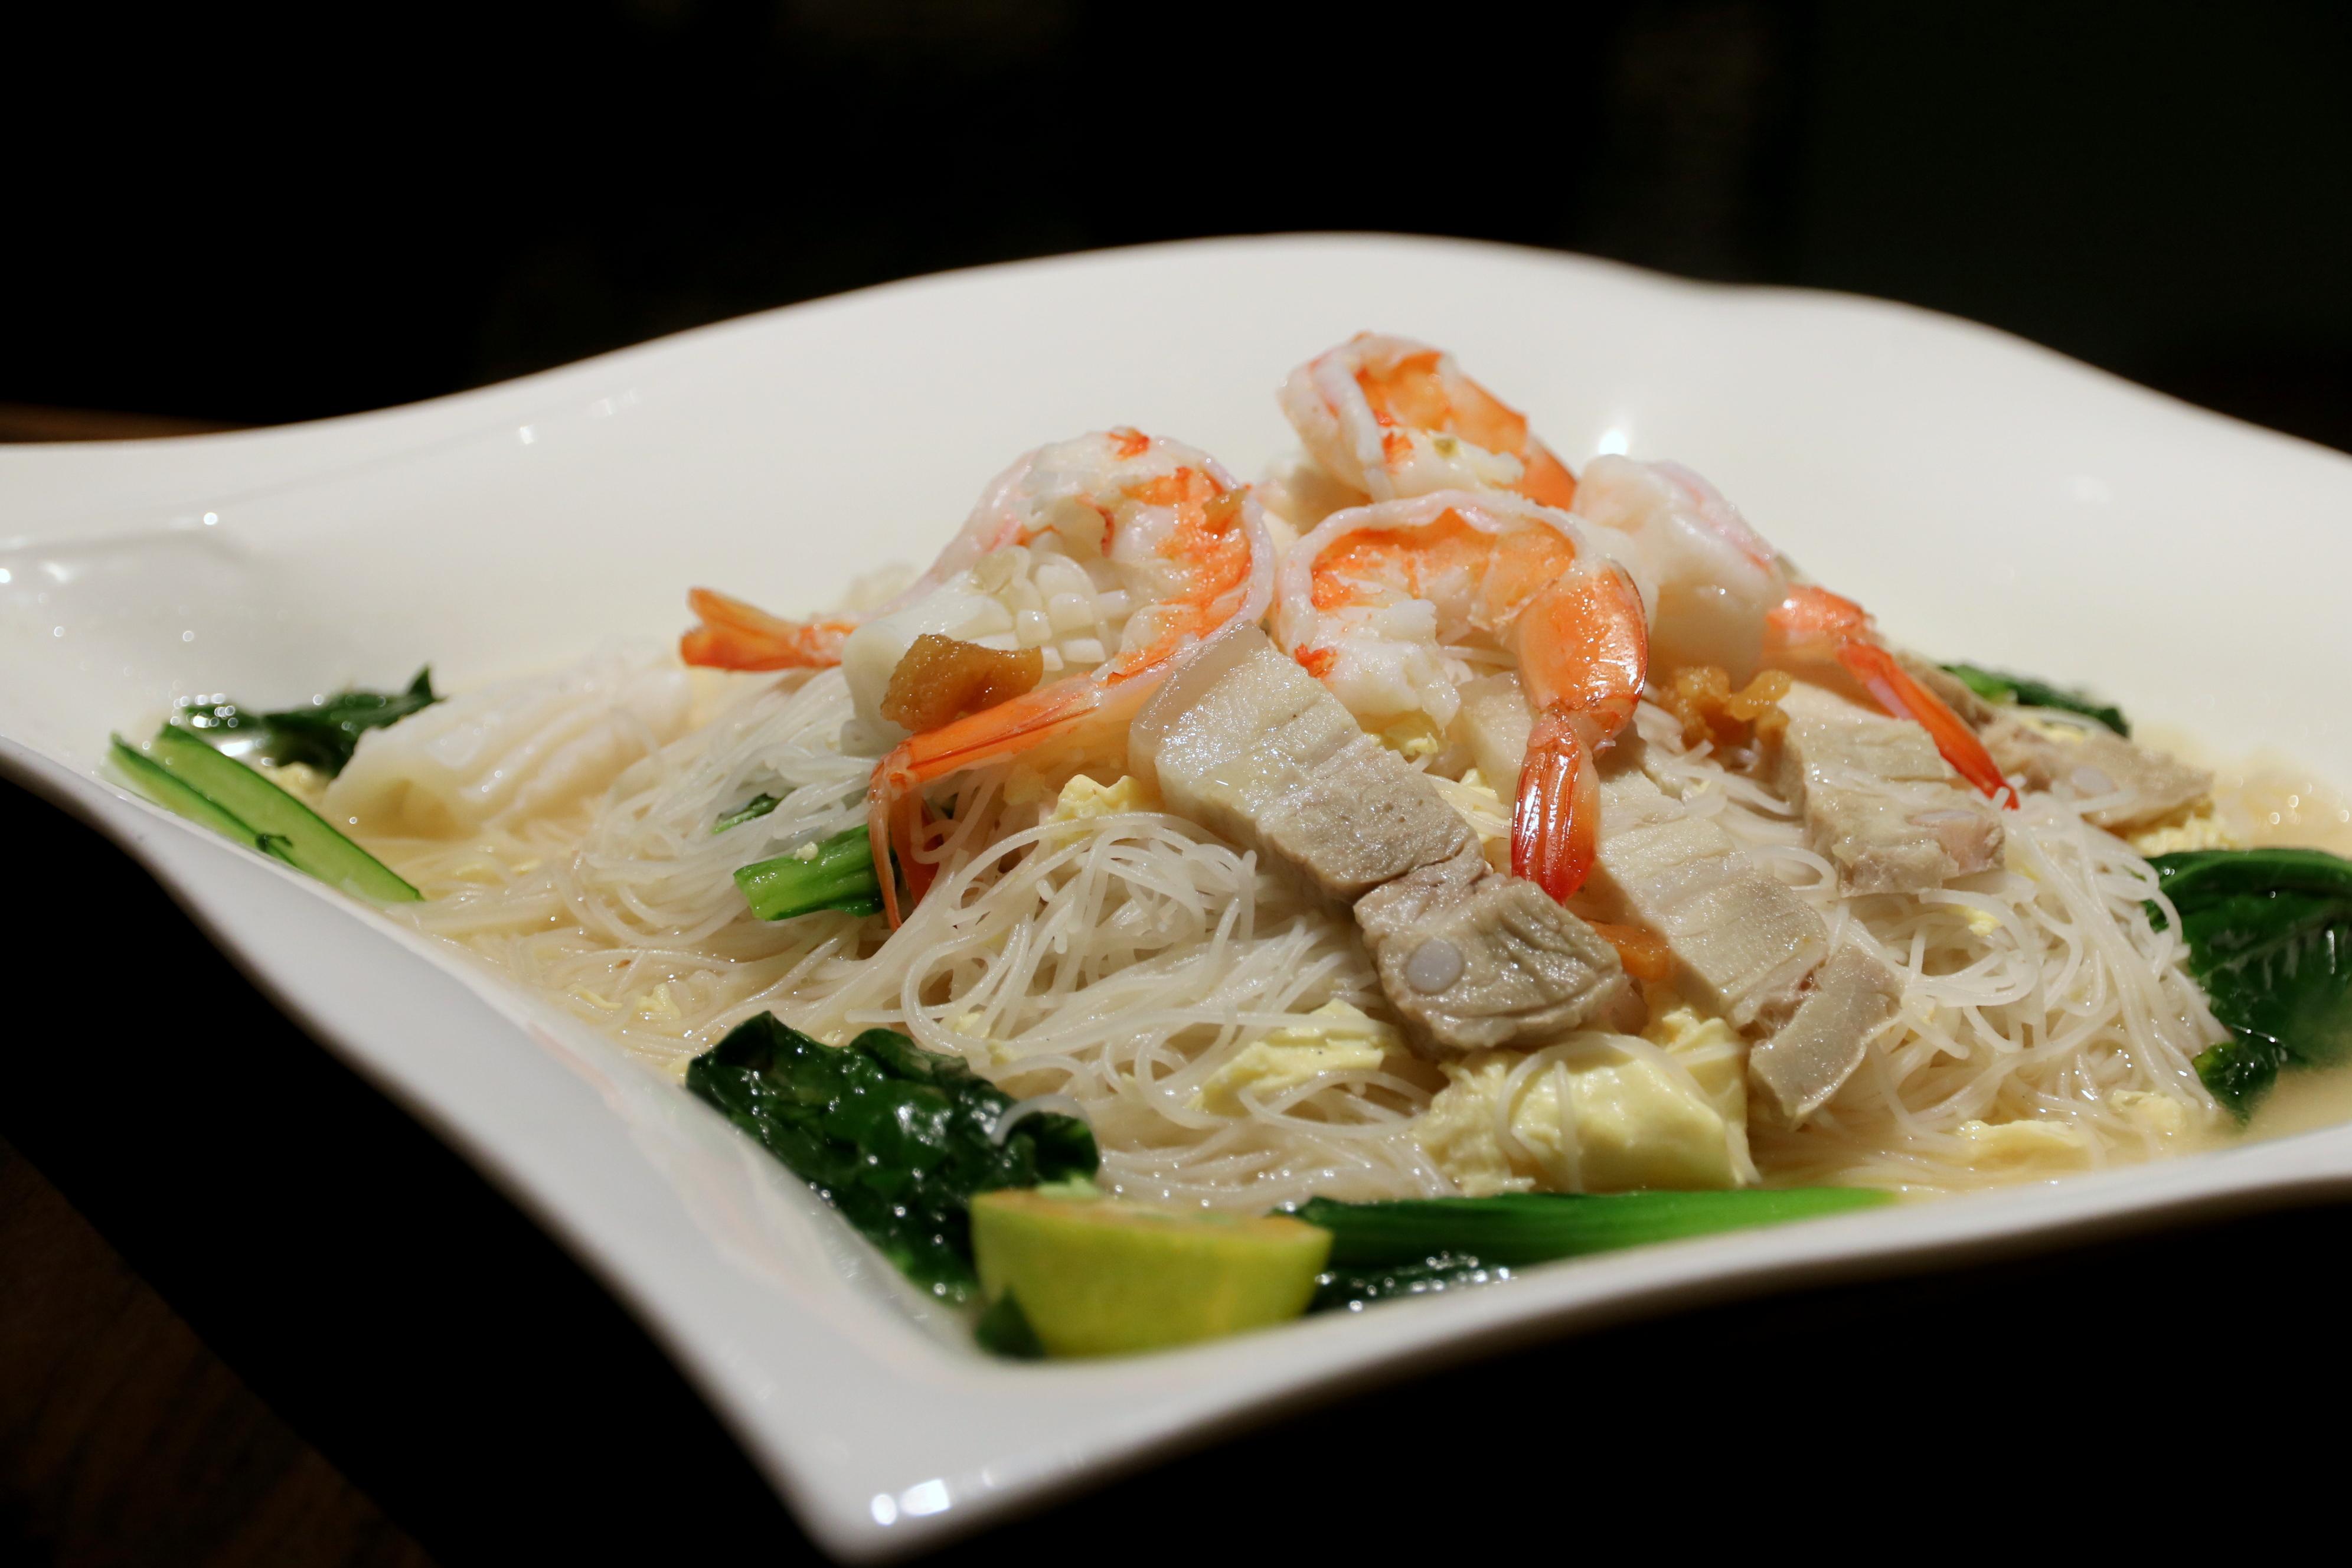 food review white rose caf at york hotel singapore wok. Black Bedroom Furniture Sets. Home Design Ideas